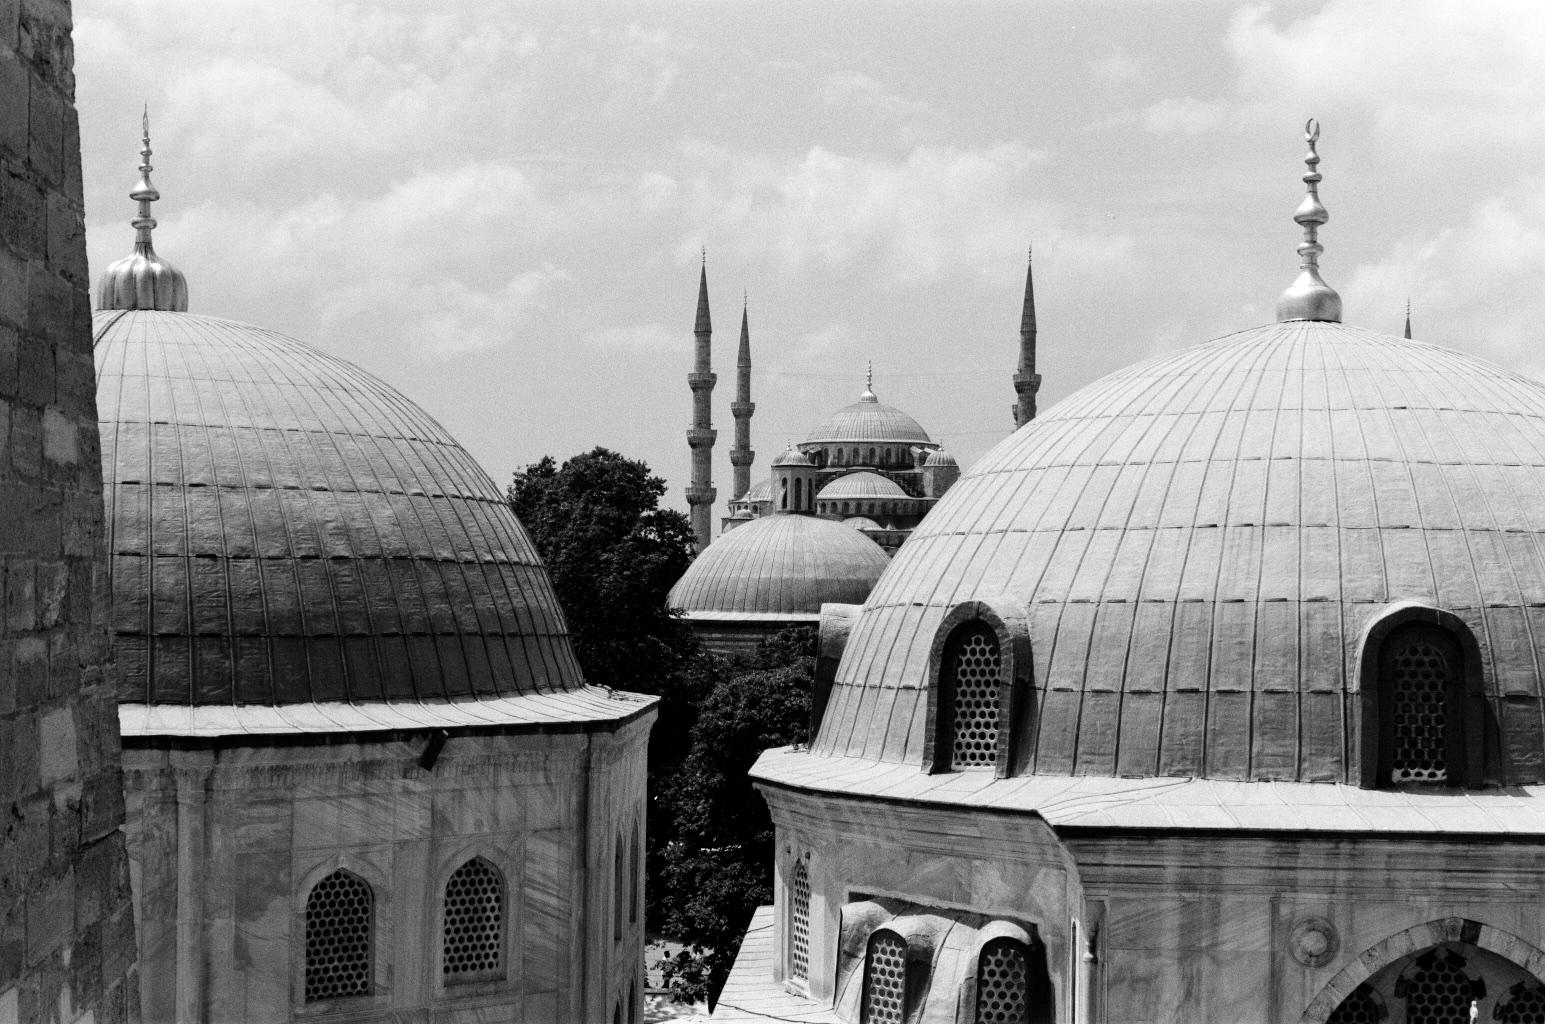 050_IstanbulRoofs.jpg